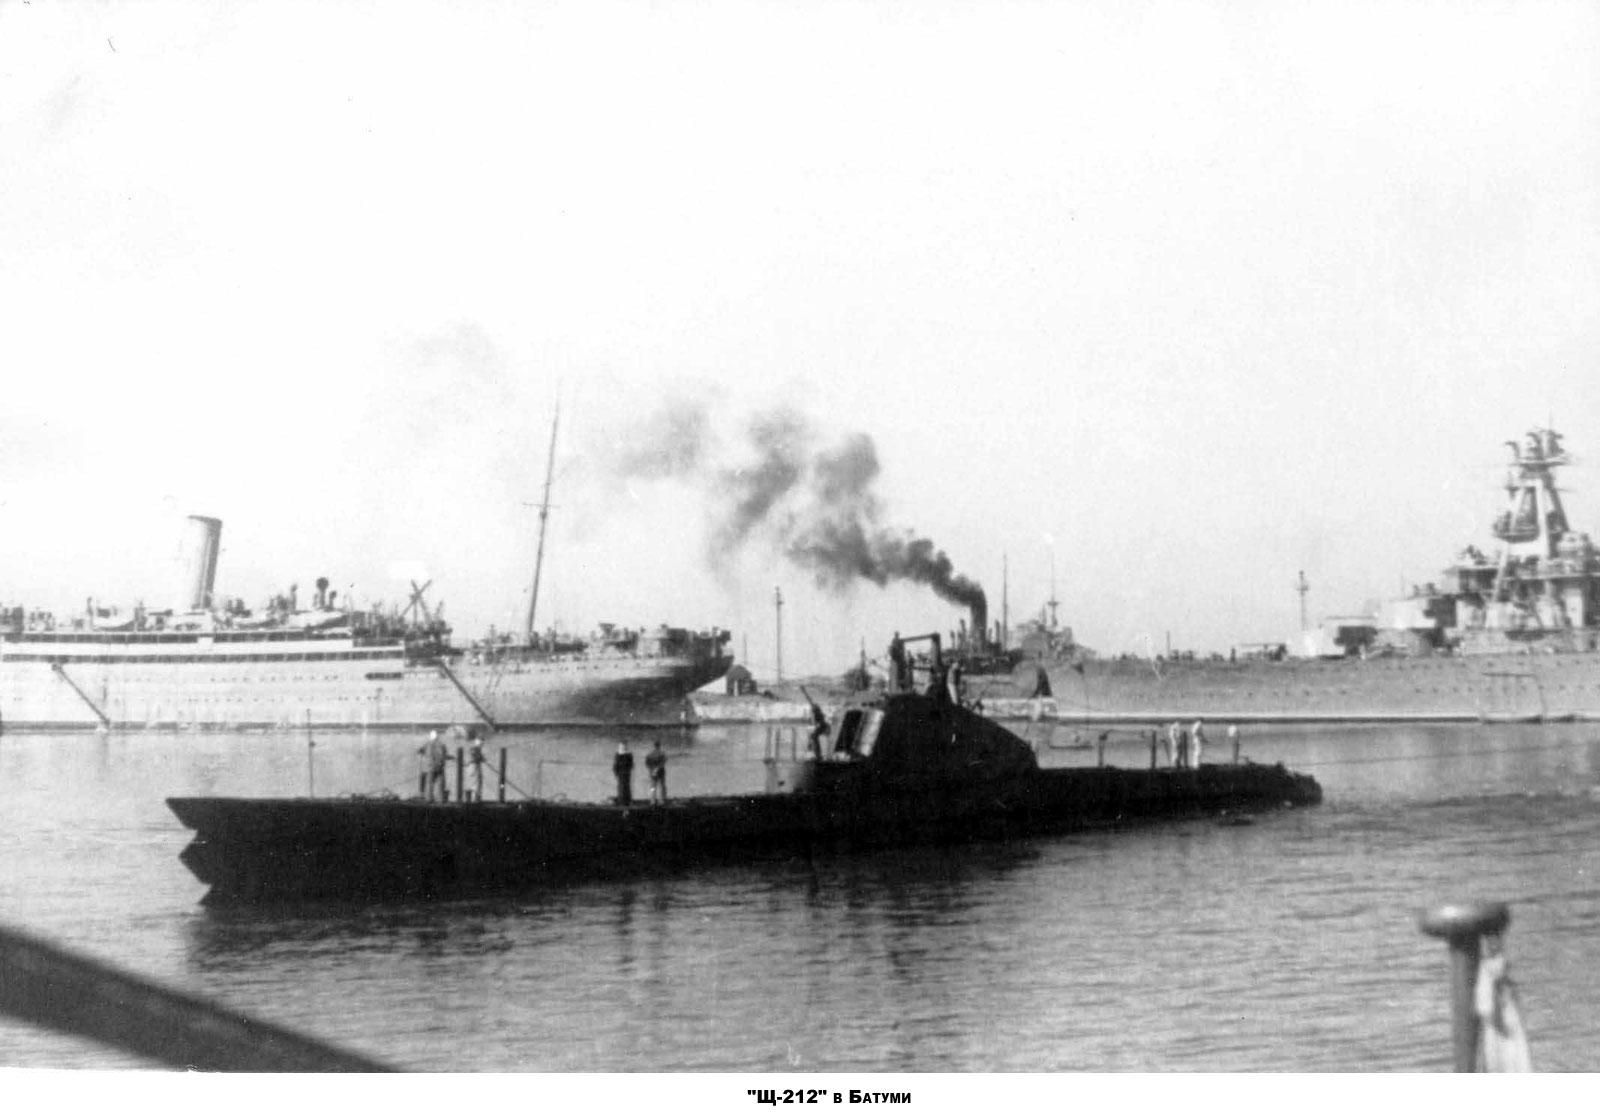 http://www.navy.su/navysub191745/sha_x/images/sha-212_01.jpg